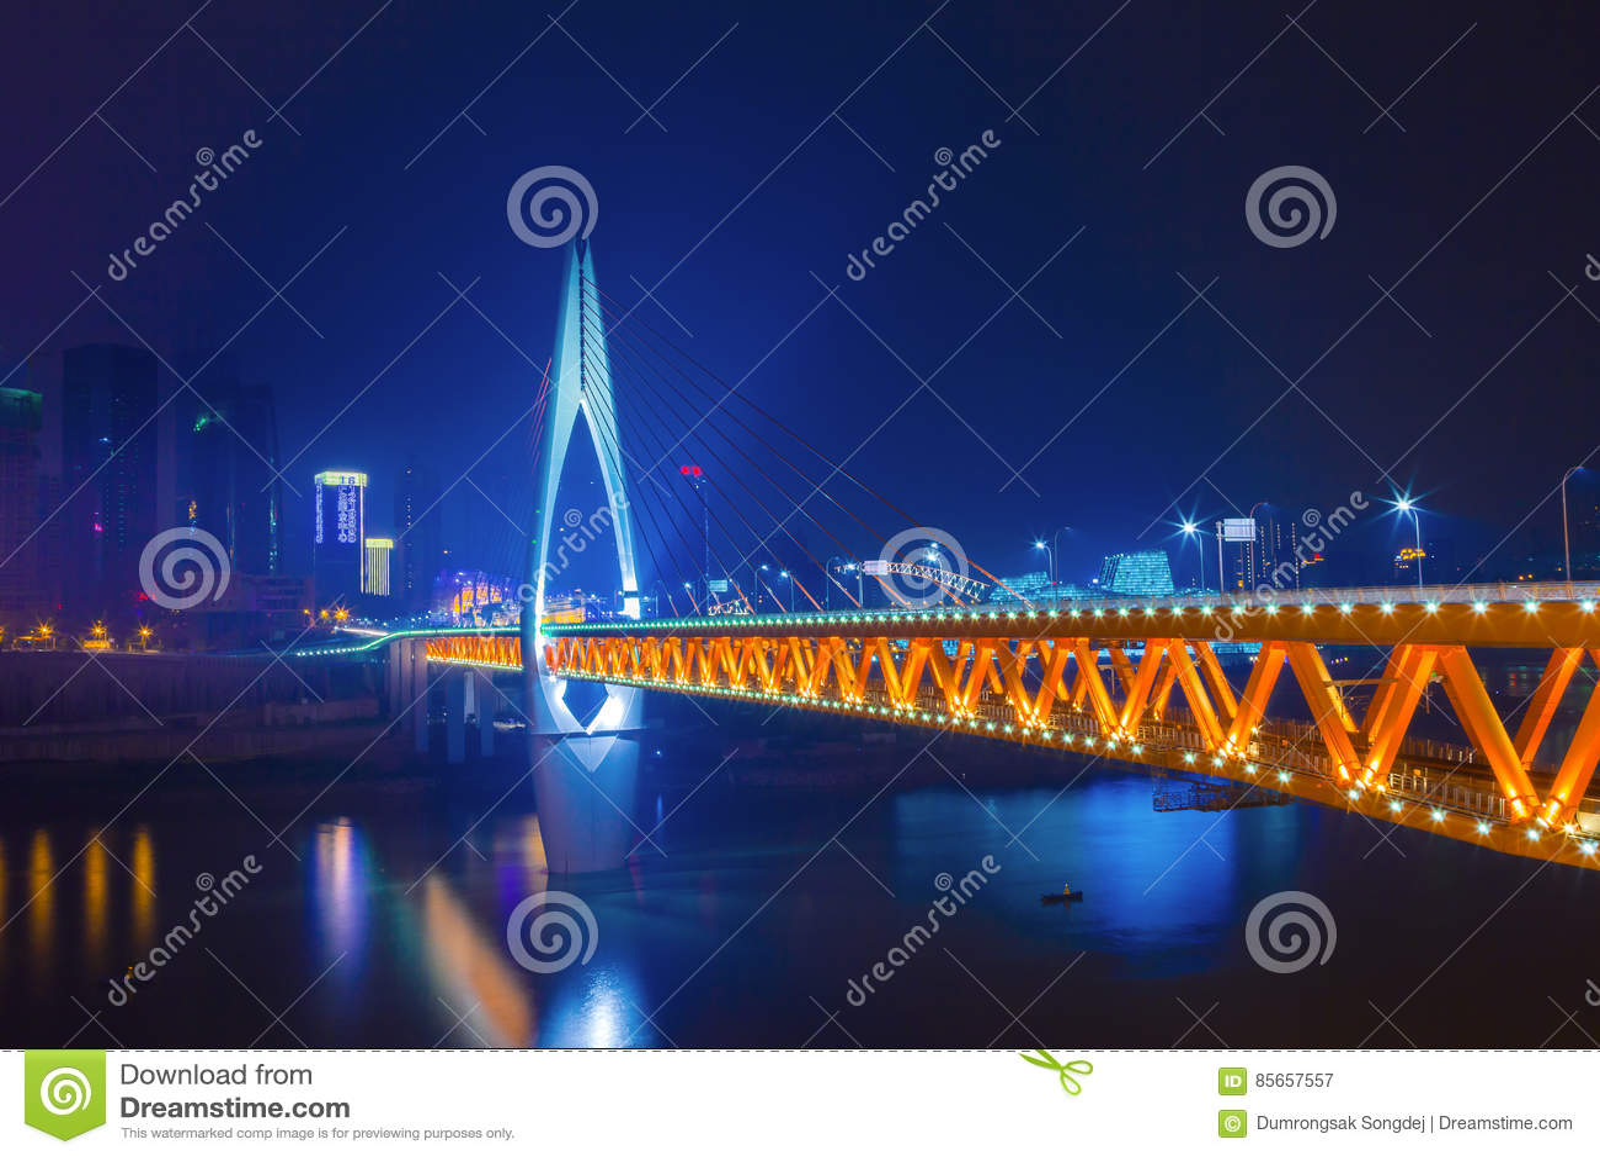 The skyline bridge over the Jialing river Landmark of Chongqing